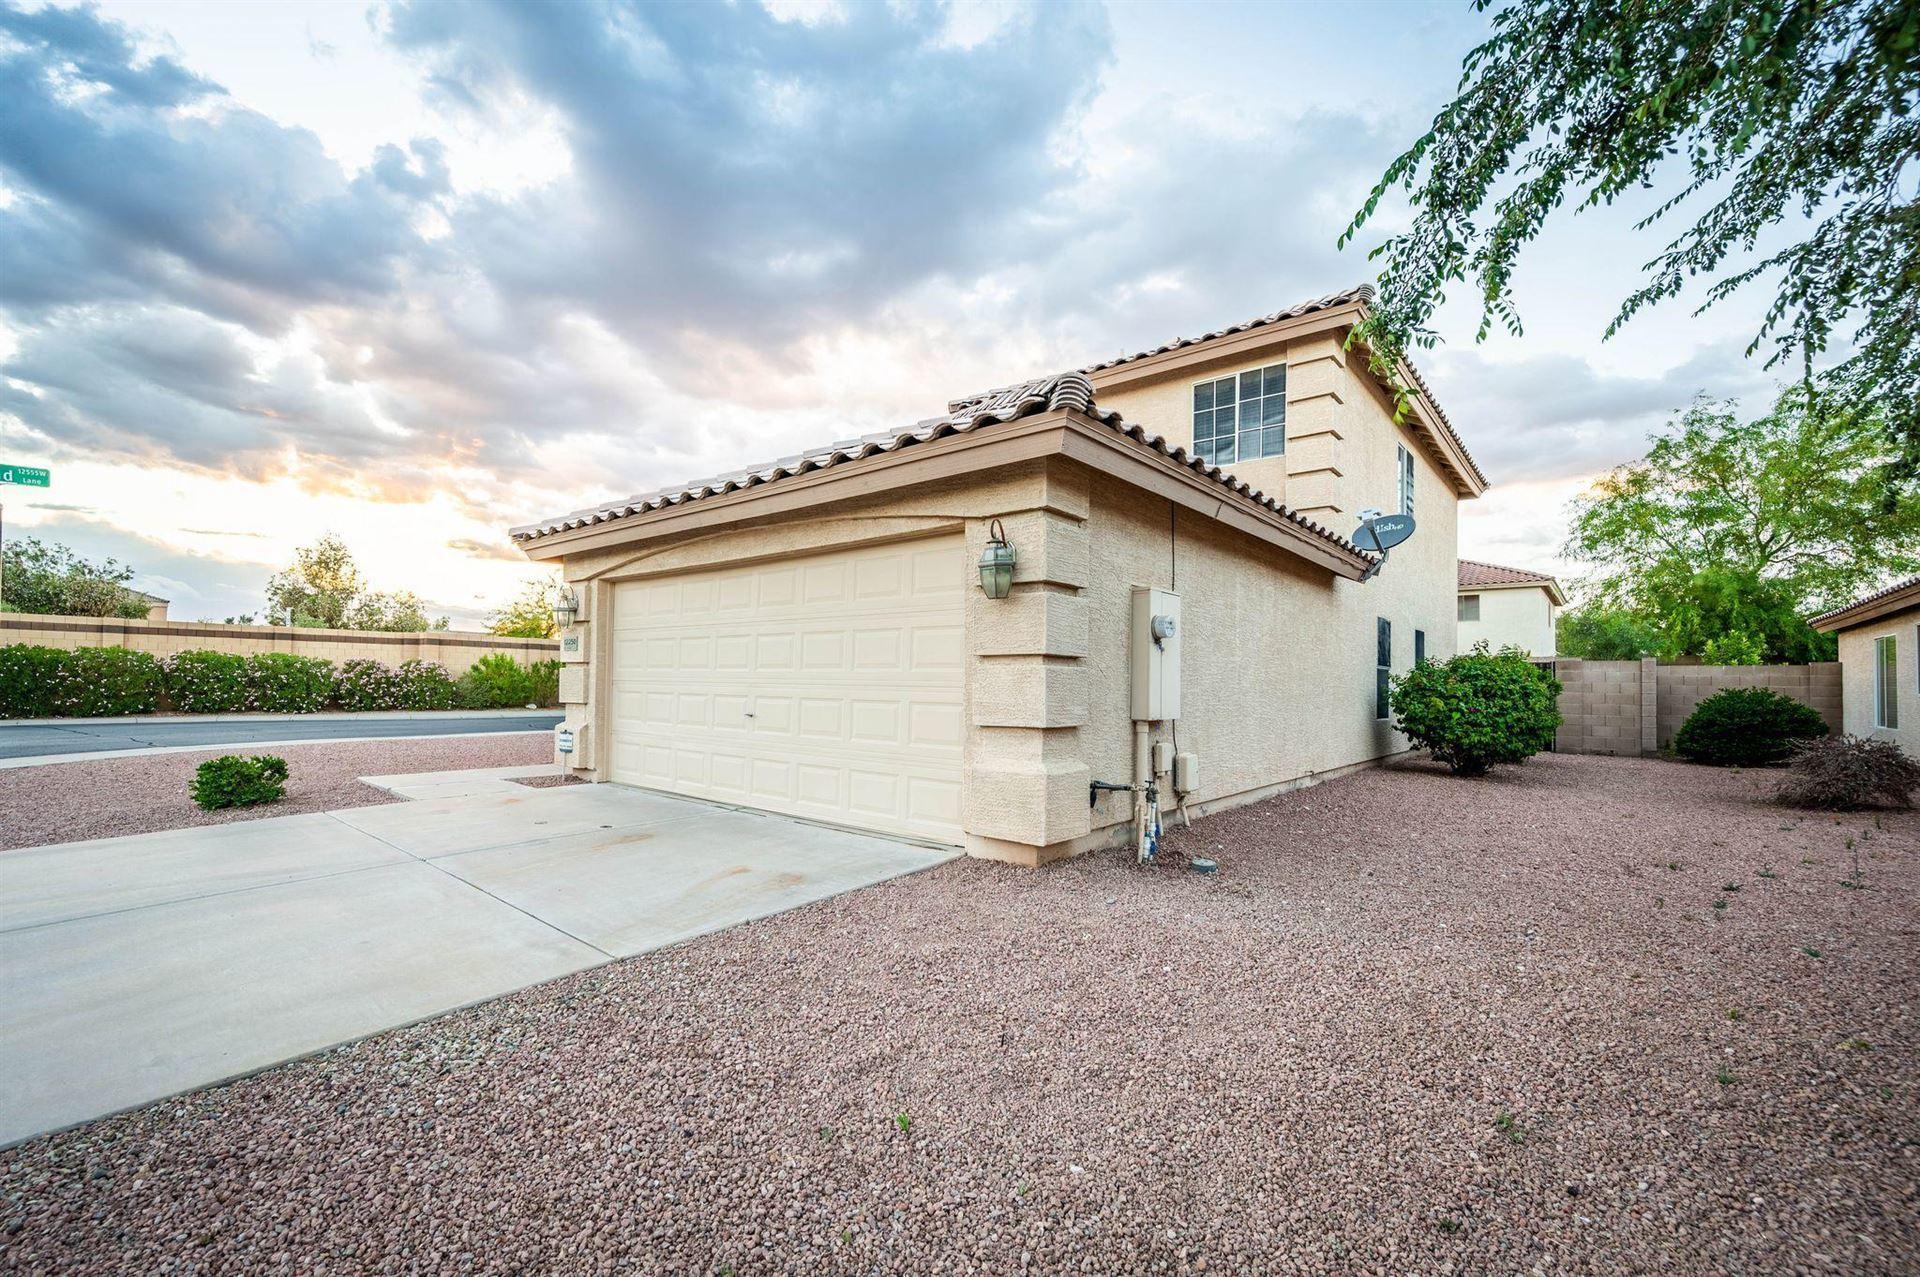 Photo of 12250 W Bloomfield Road, El Mirage, AZ 85335 (MLS # 6229302)